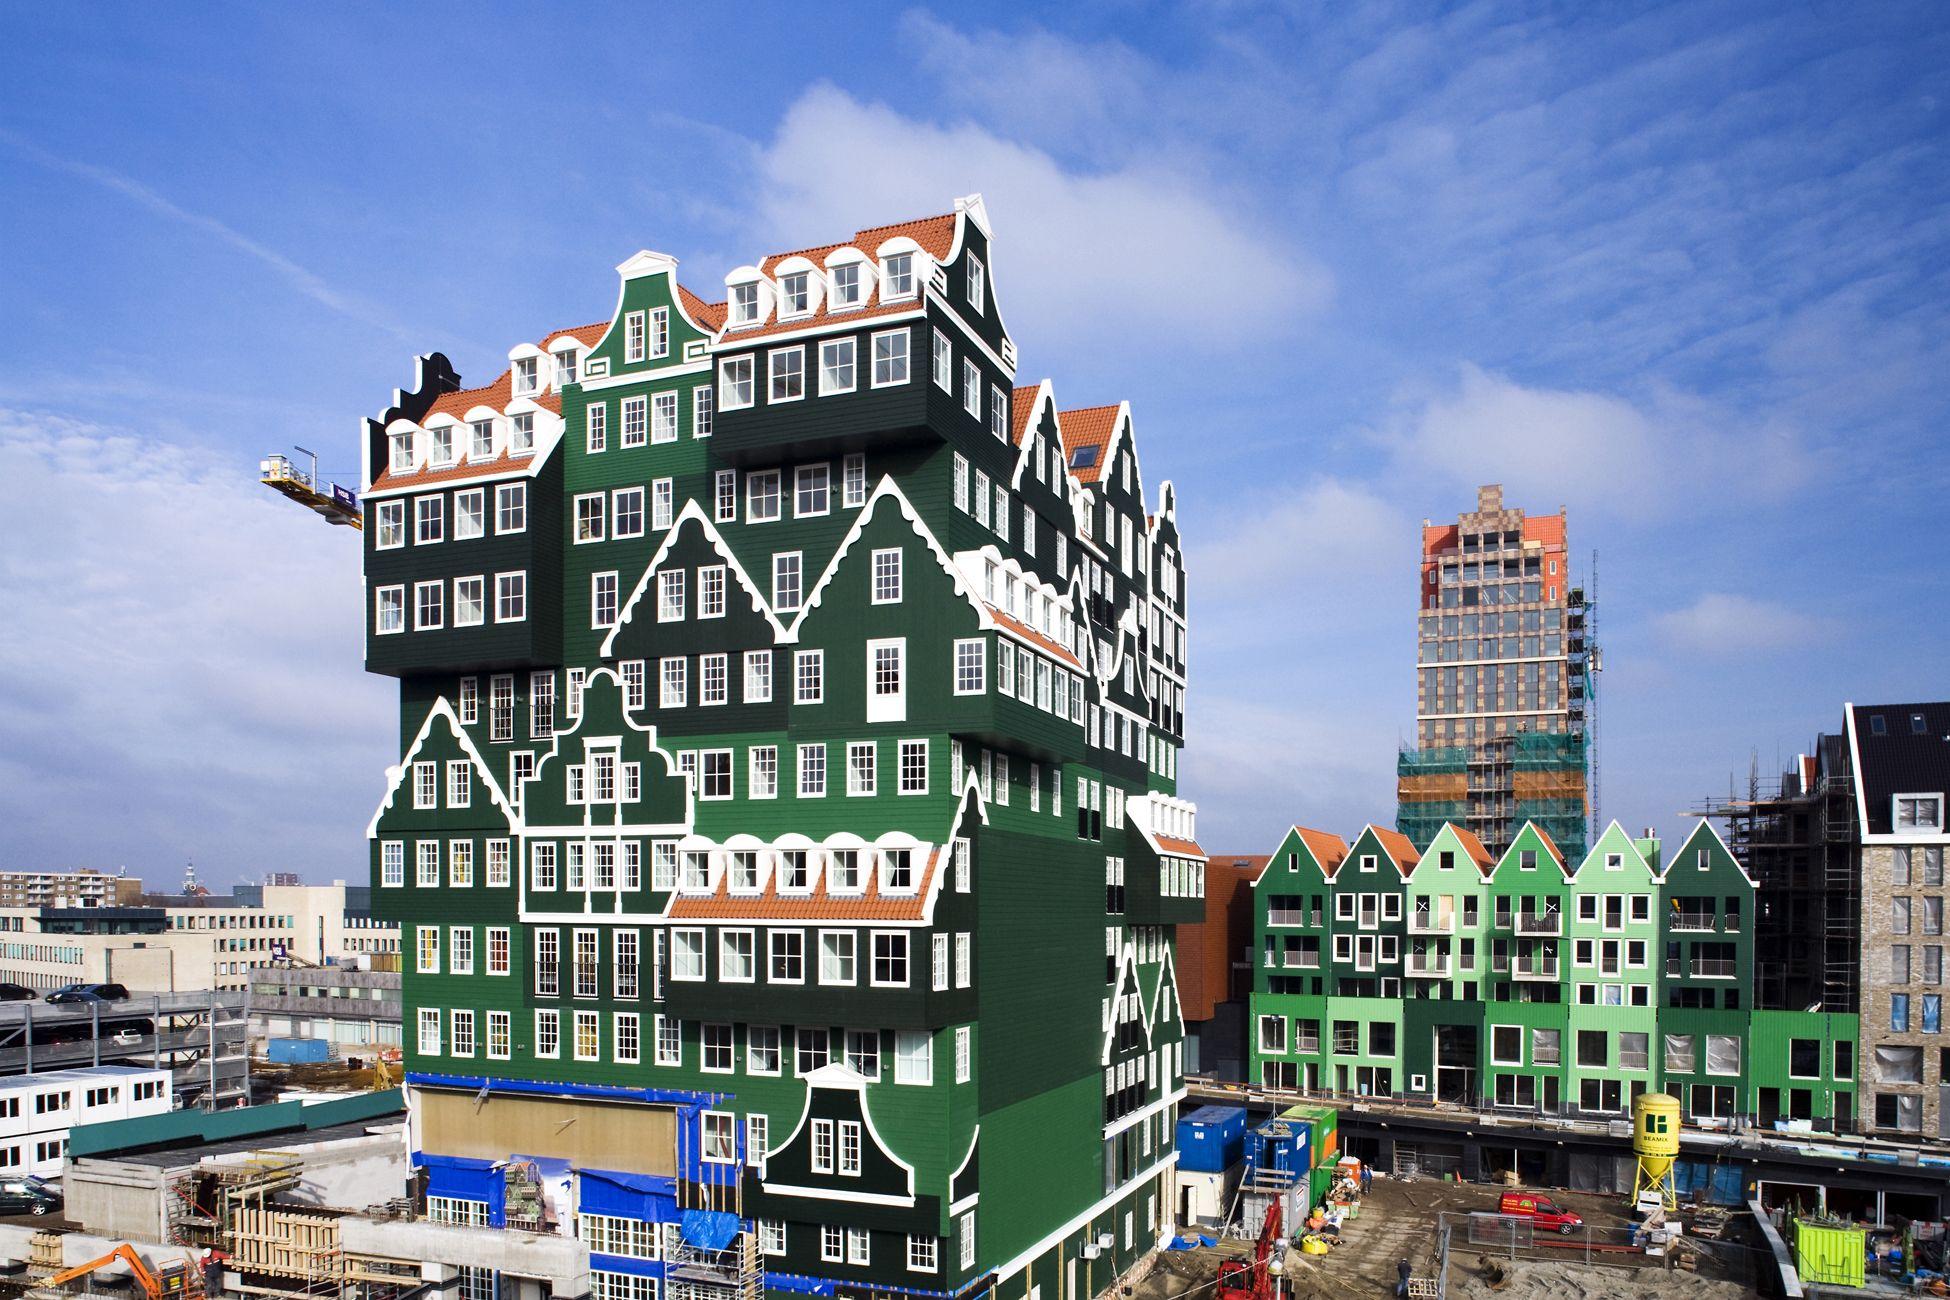 Much Of A Dutchness The Hotel Inntel Zaandam